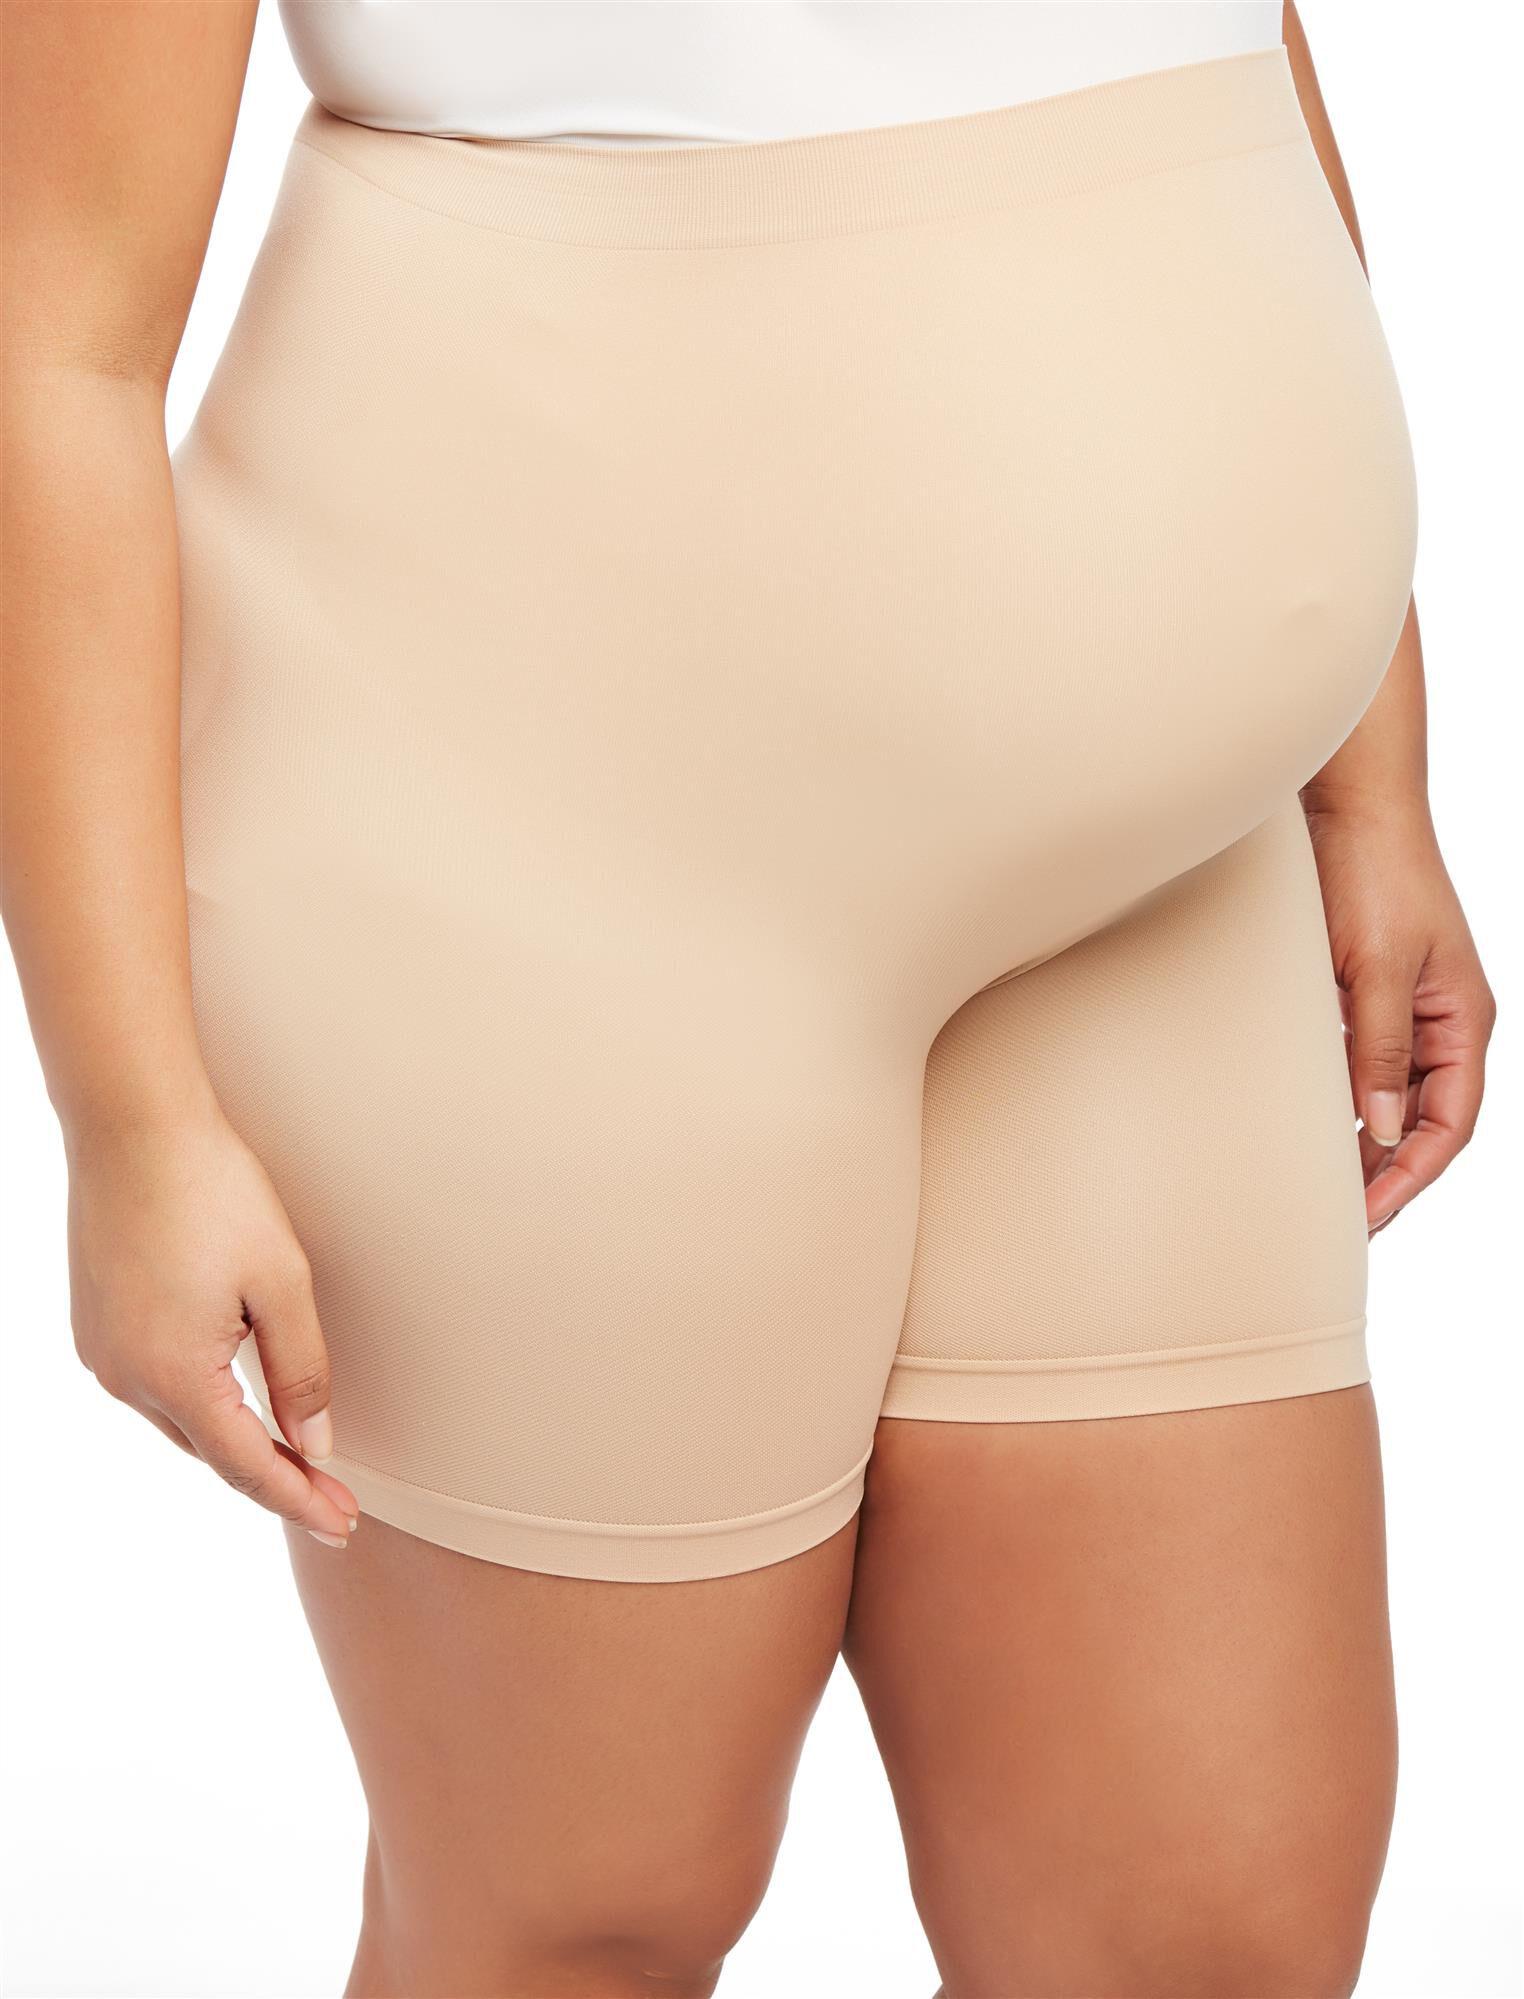 Maternity Underwear & Lingerie   Motherhood Maternity